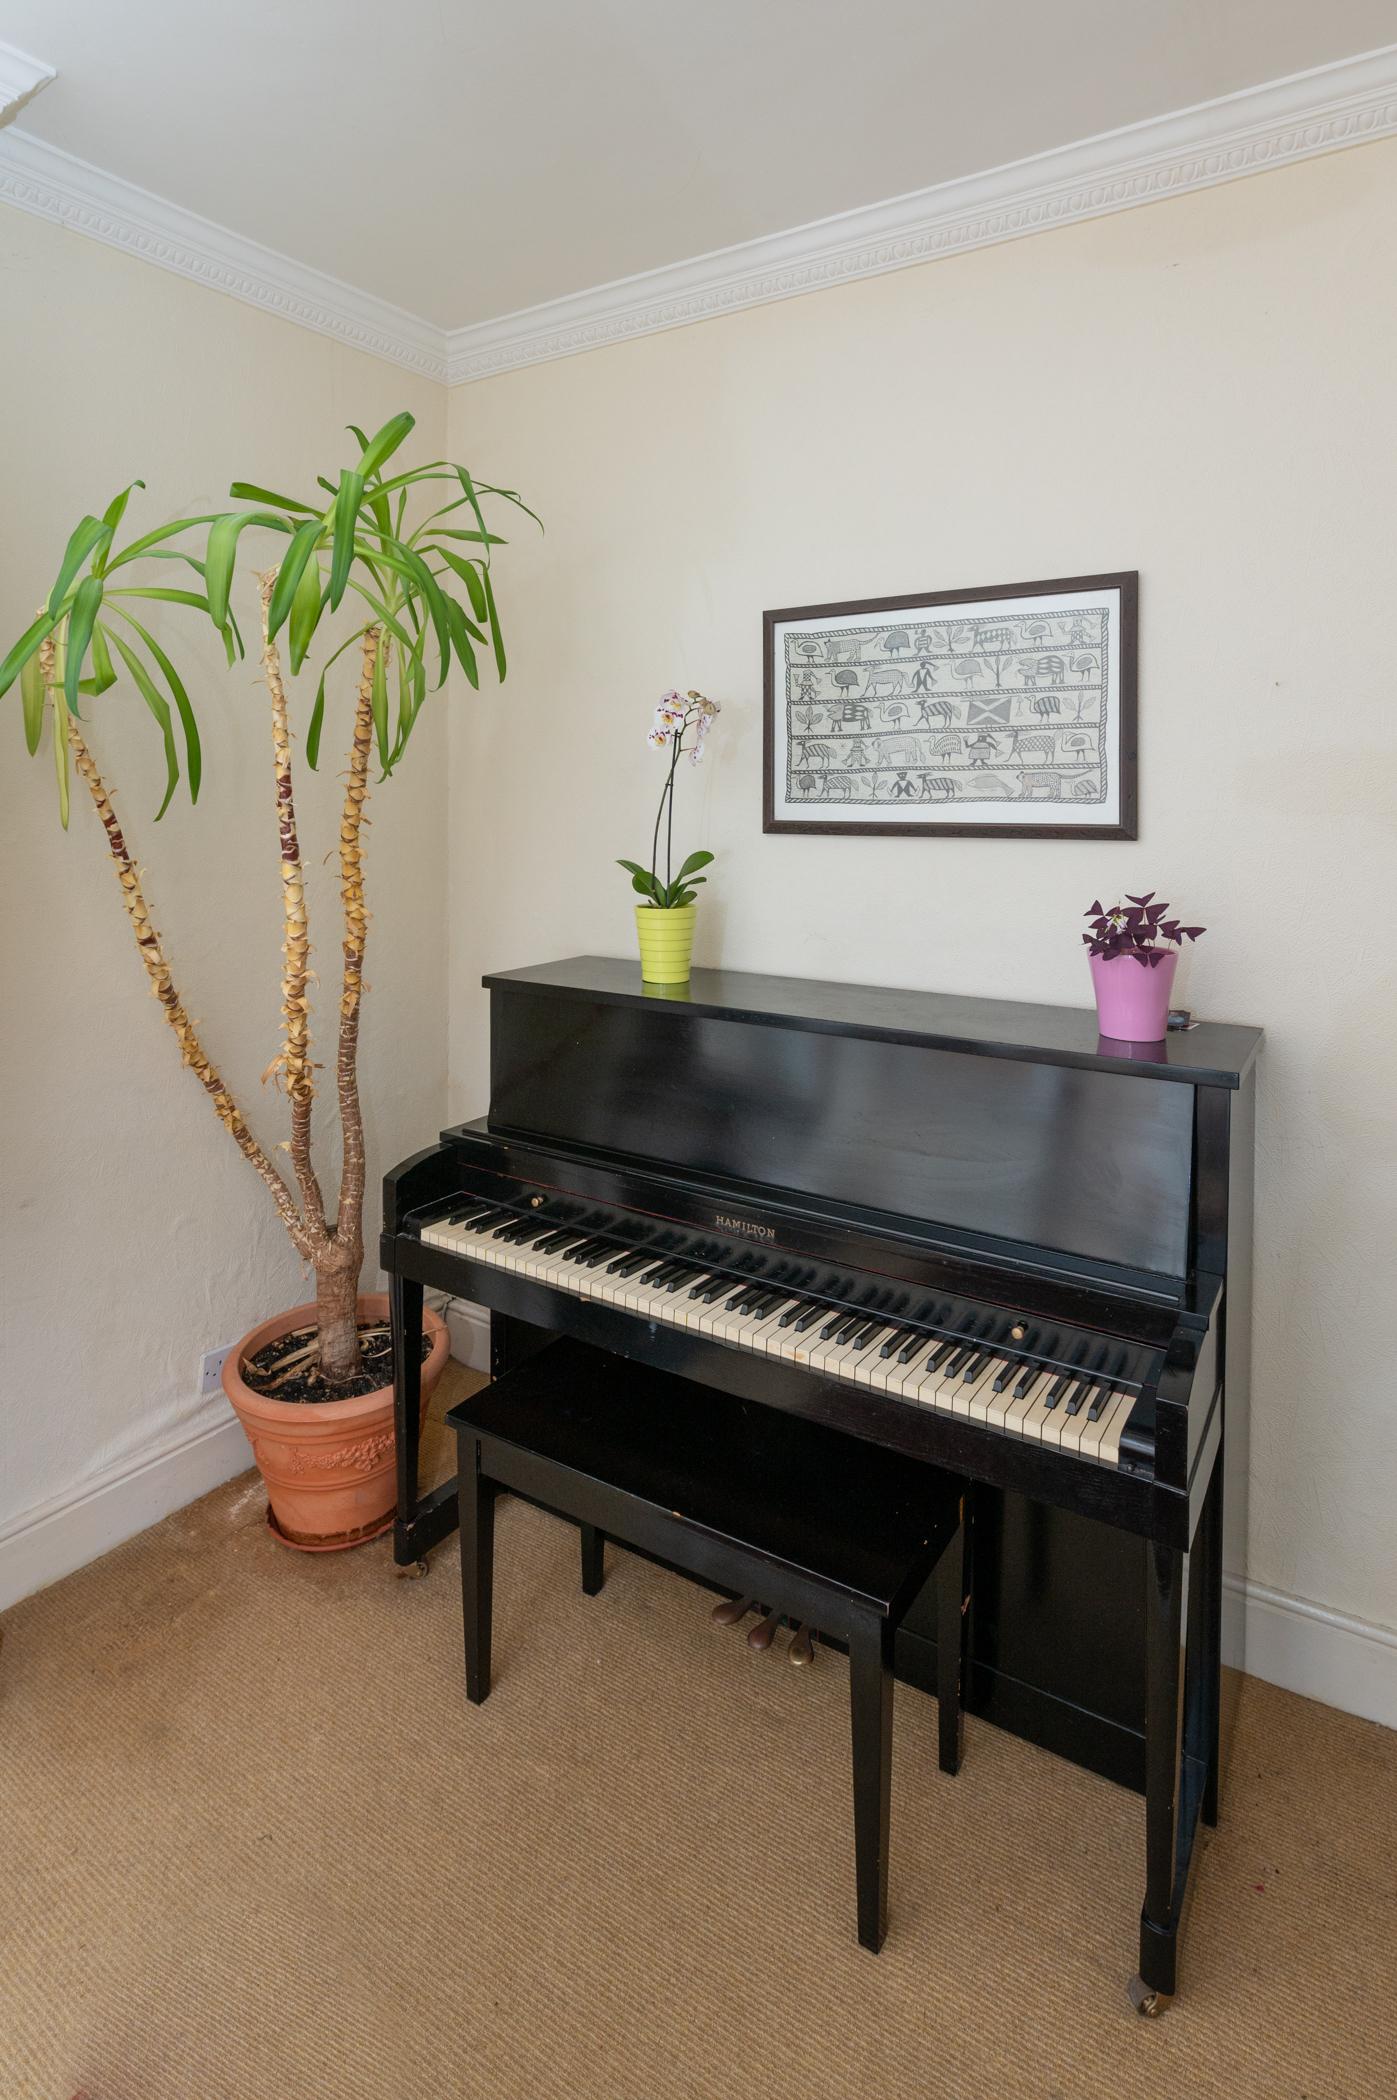 https://kms-keanemahonysmith.s3.amazonaws.com/media/111_piano.jpg